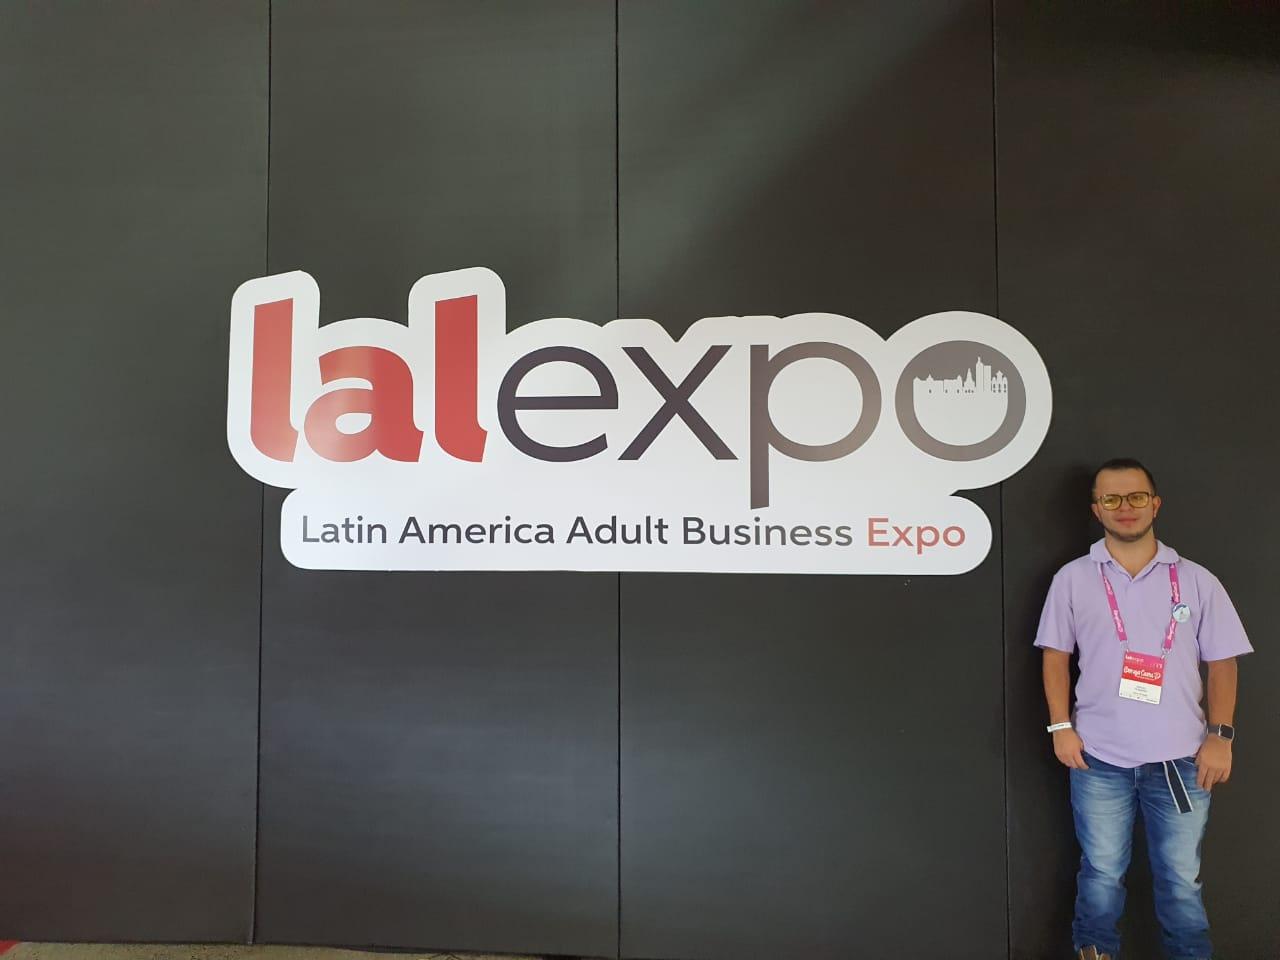 Lalexpo Cali 2020 Maju Studios